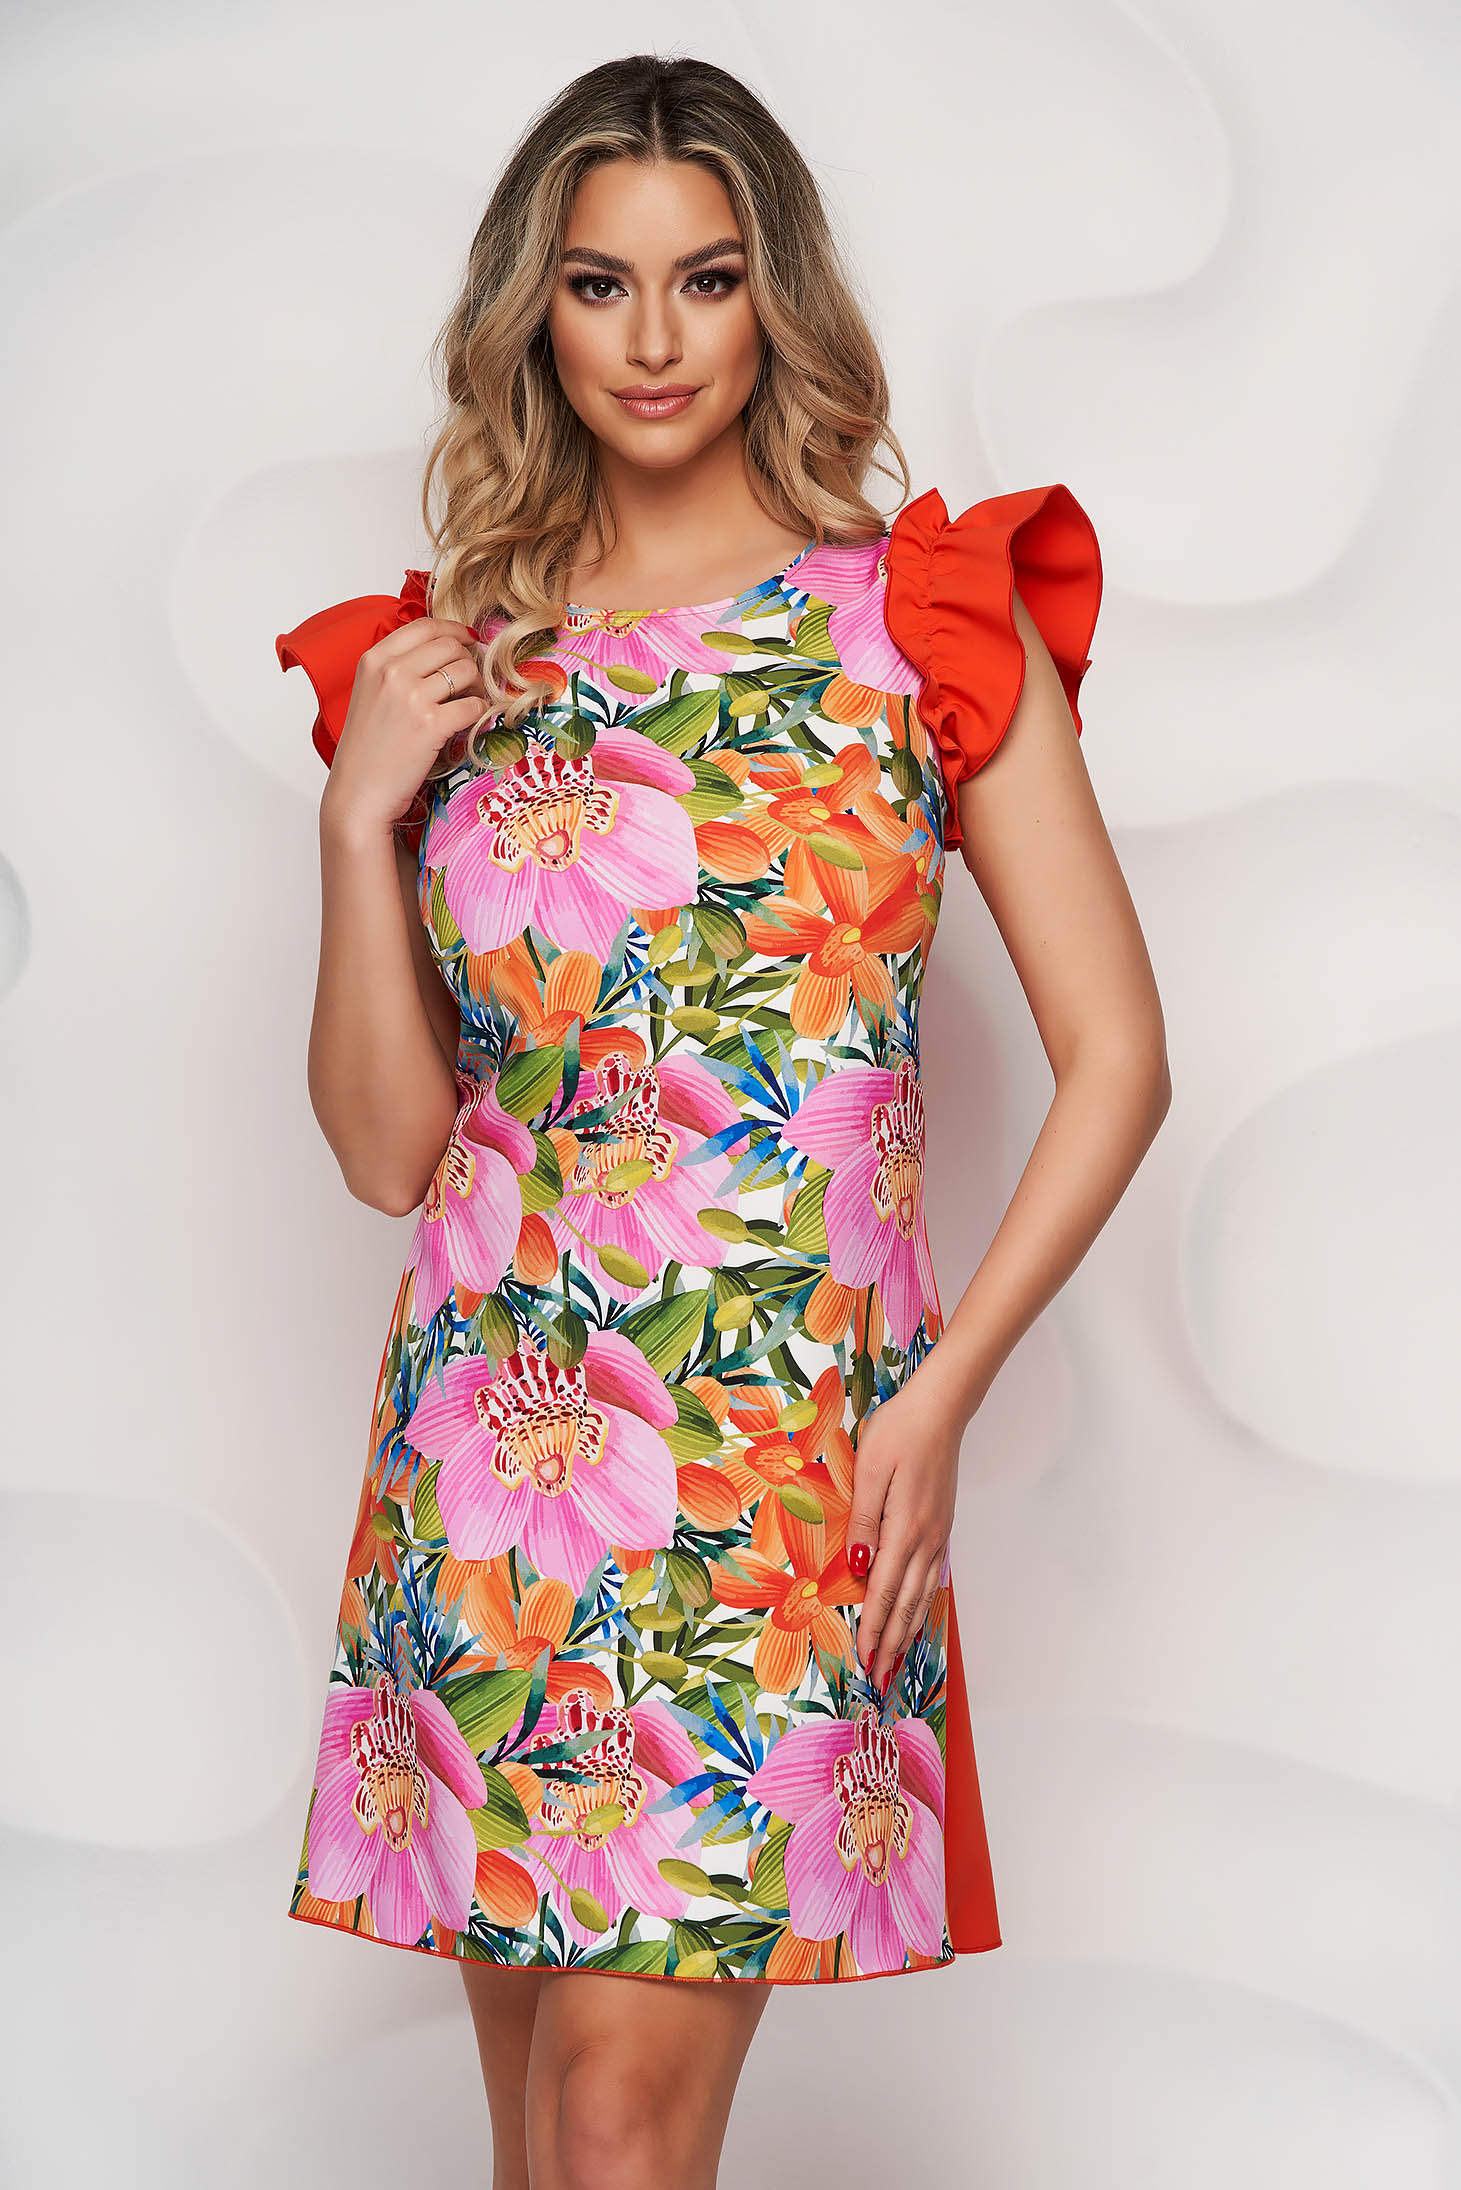 StarShinerS dress slightly elastic fabric elegant short cut loose fit